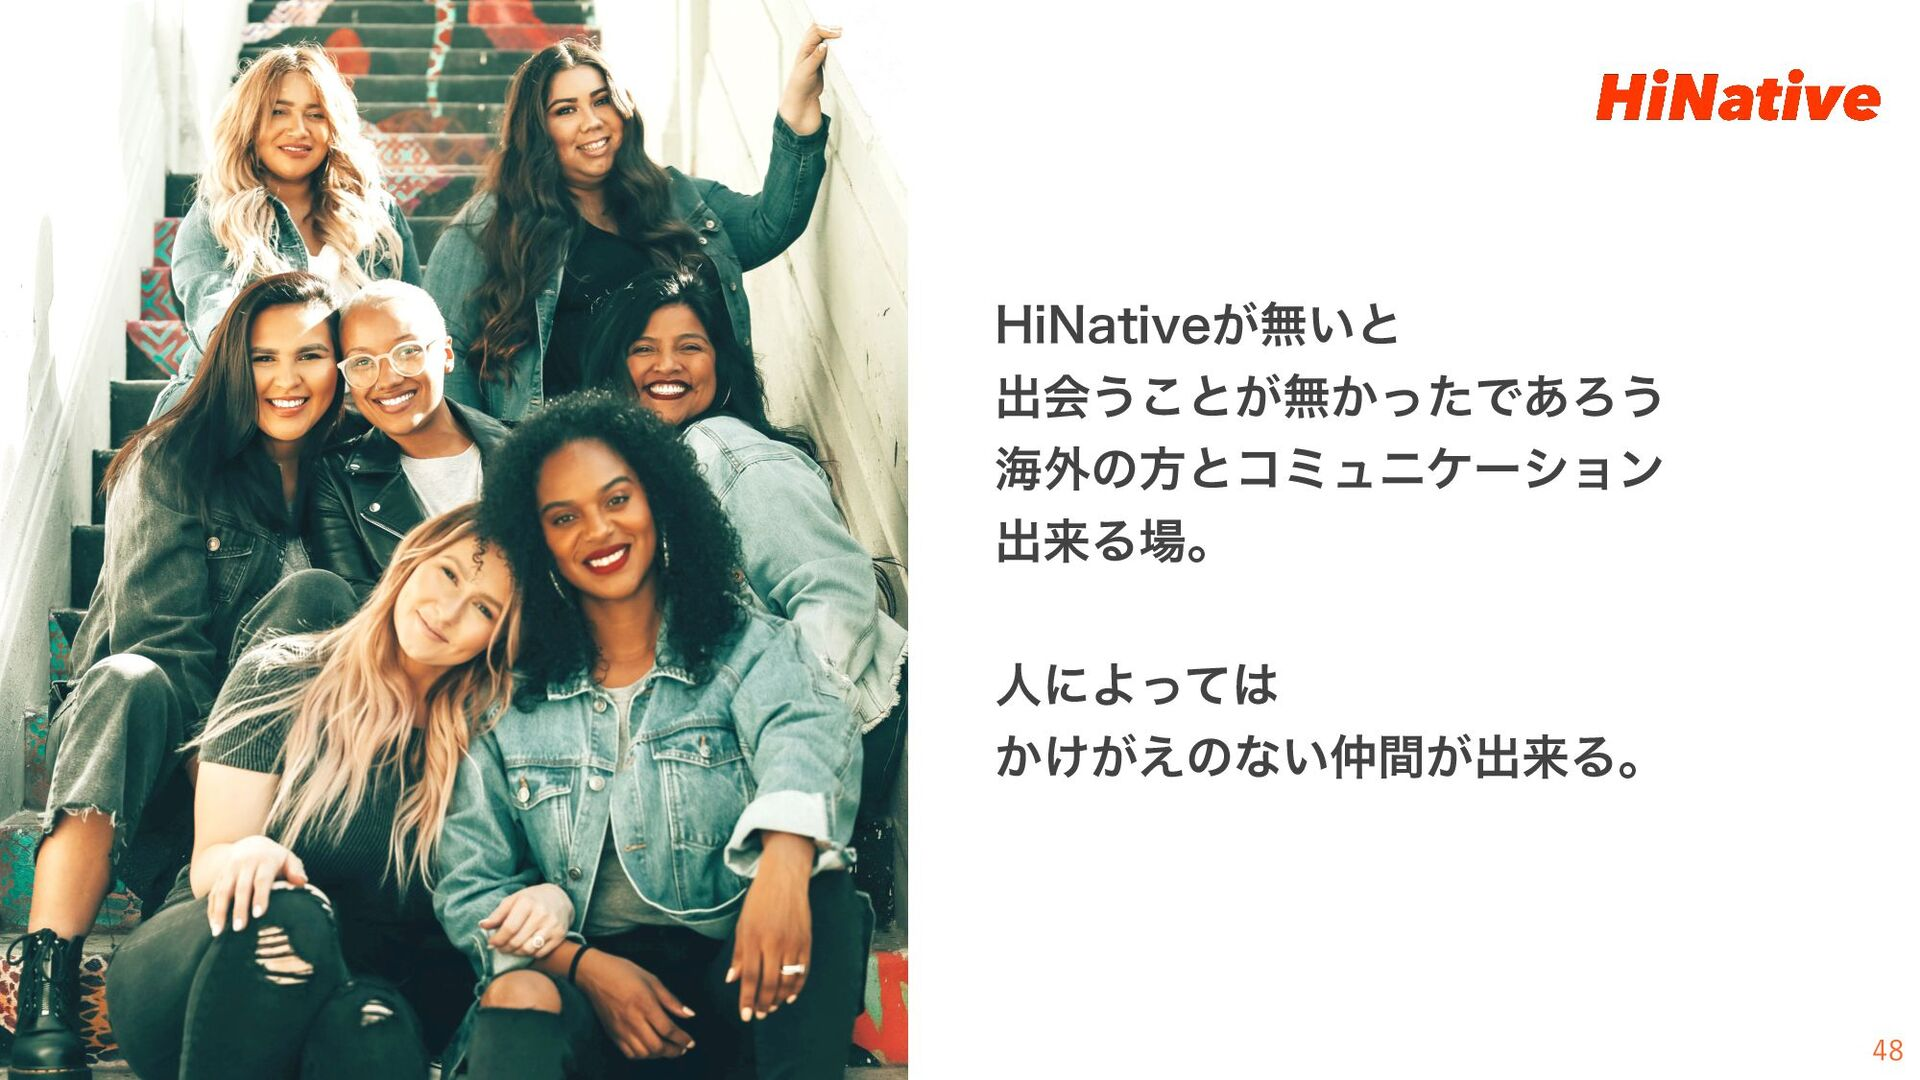 )J/BUJWFʹΑΓɺ ւ֎ͷจԽਓͷཧղ͕ਐΜͩਓ͕ ଟग़ͯ͘Δɻ গ͚ͩ͠ੈք...